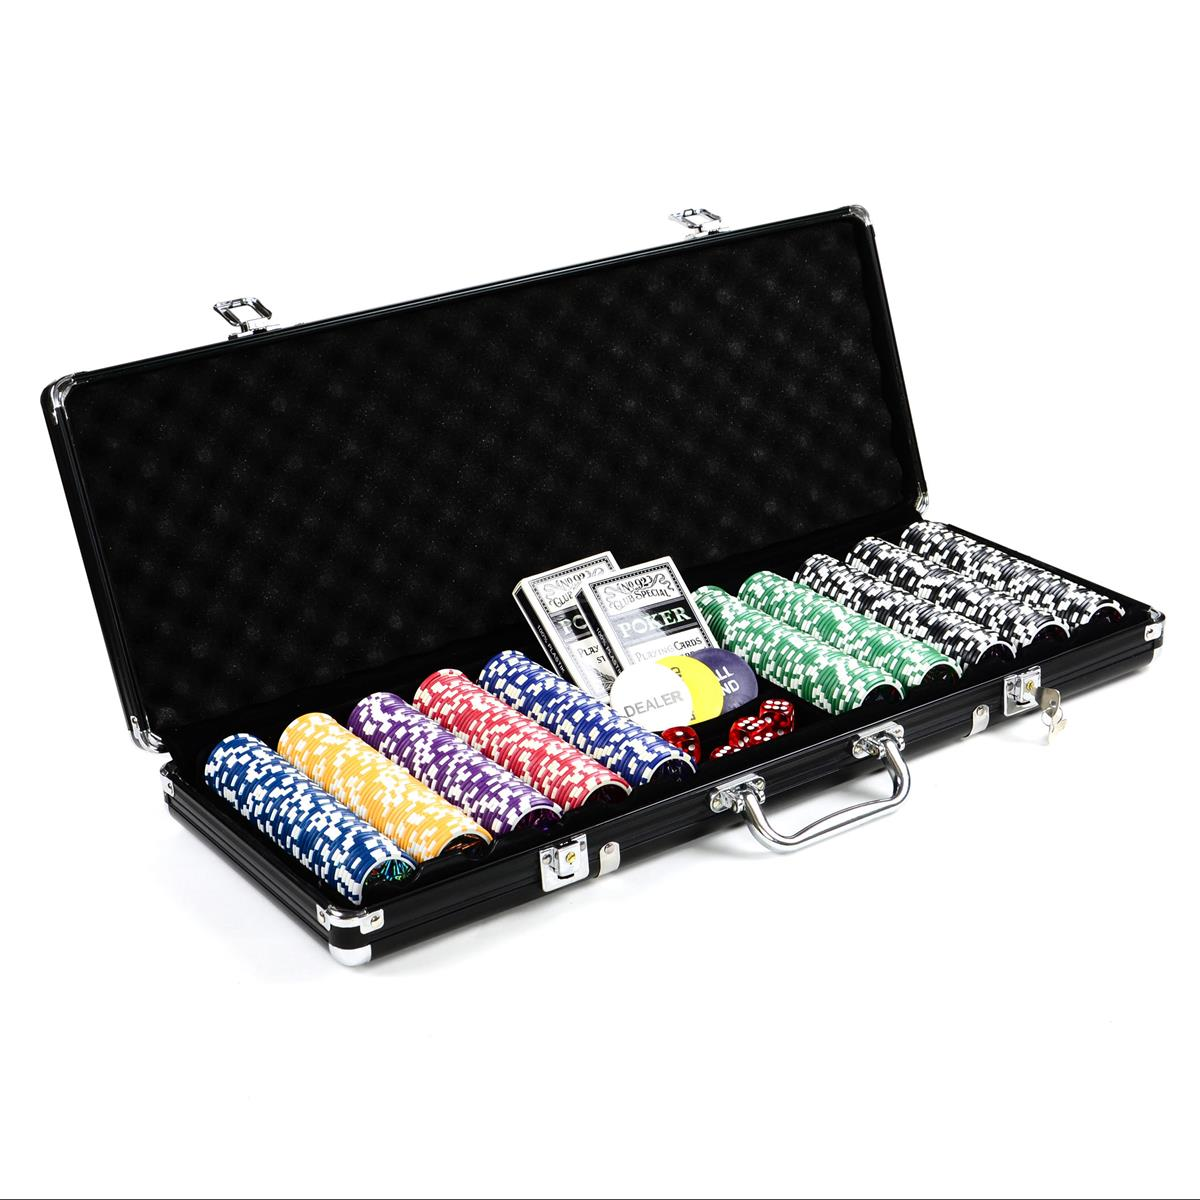 Pokerkoffer 500 OCEAN CHAMPION CHIP abgerundete Laser-Poker-Chips BLACK EDITION